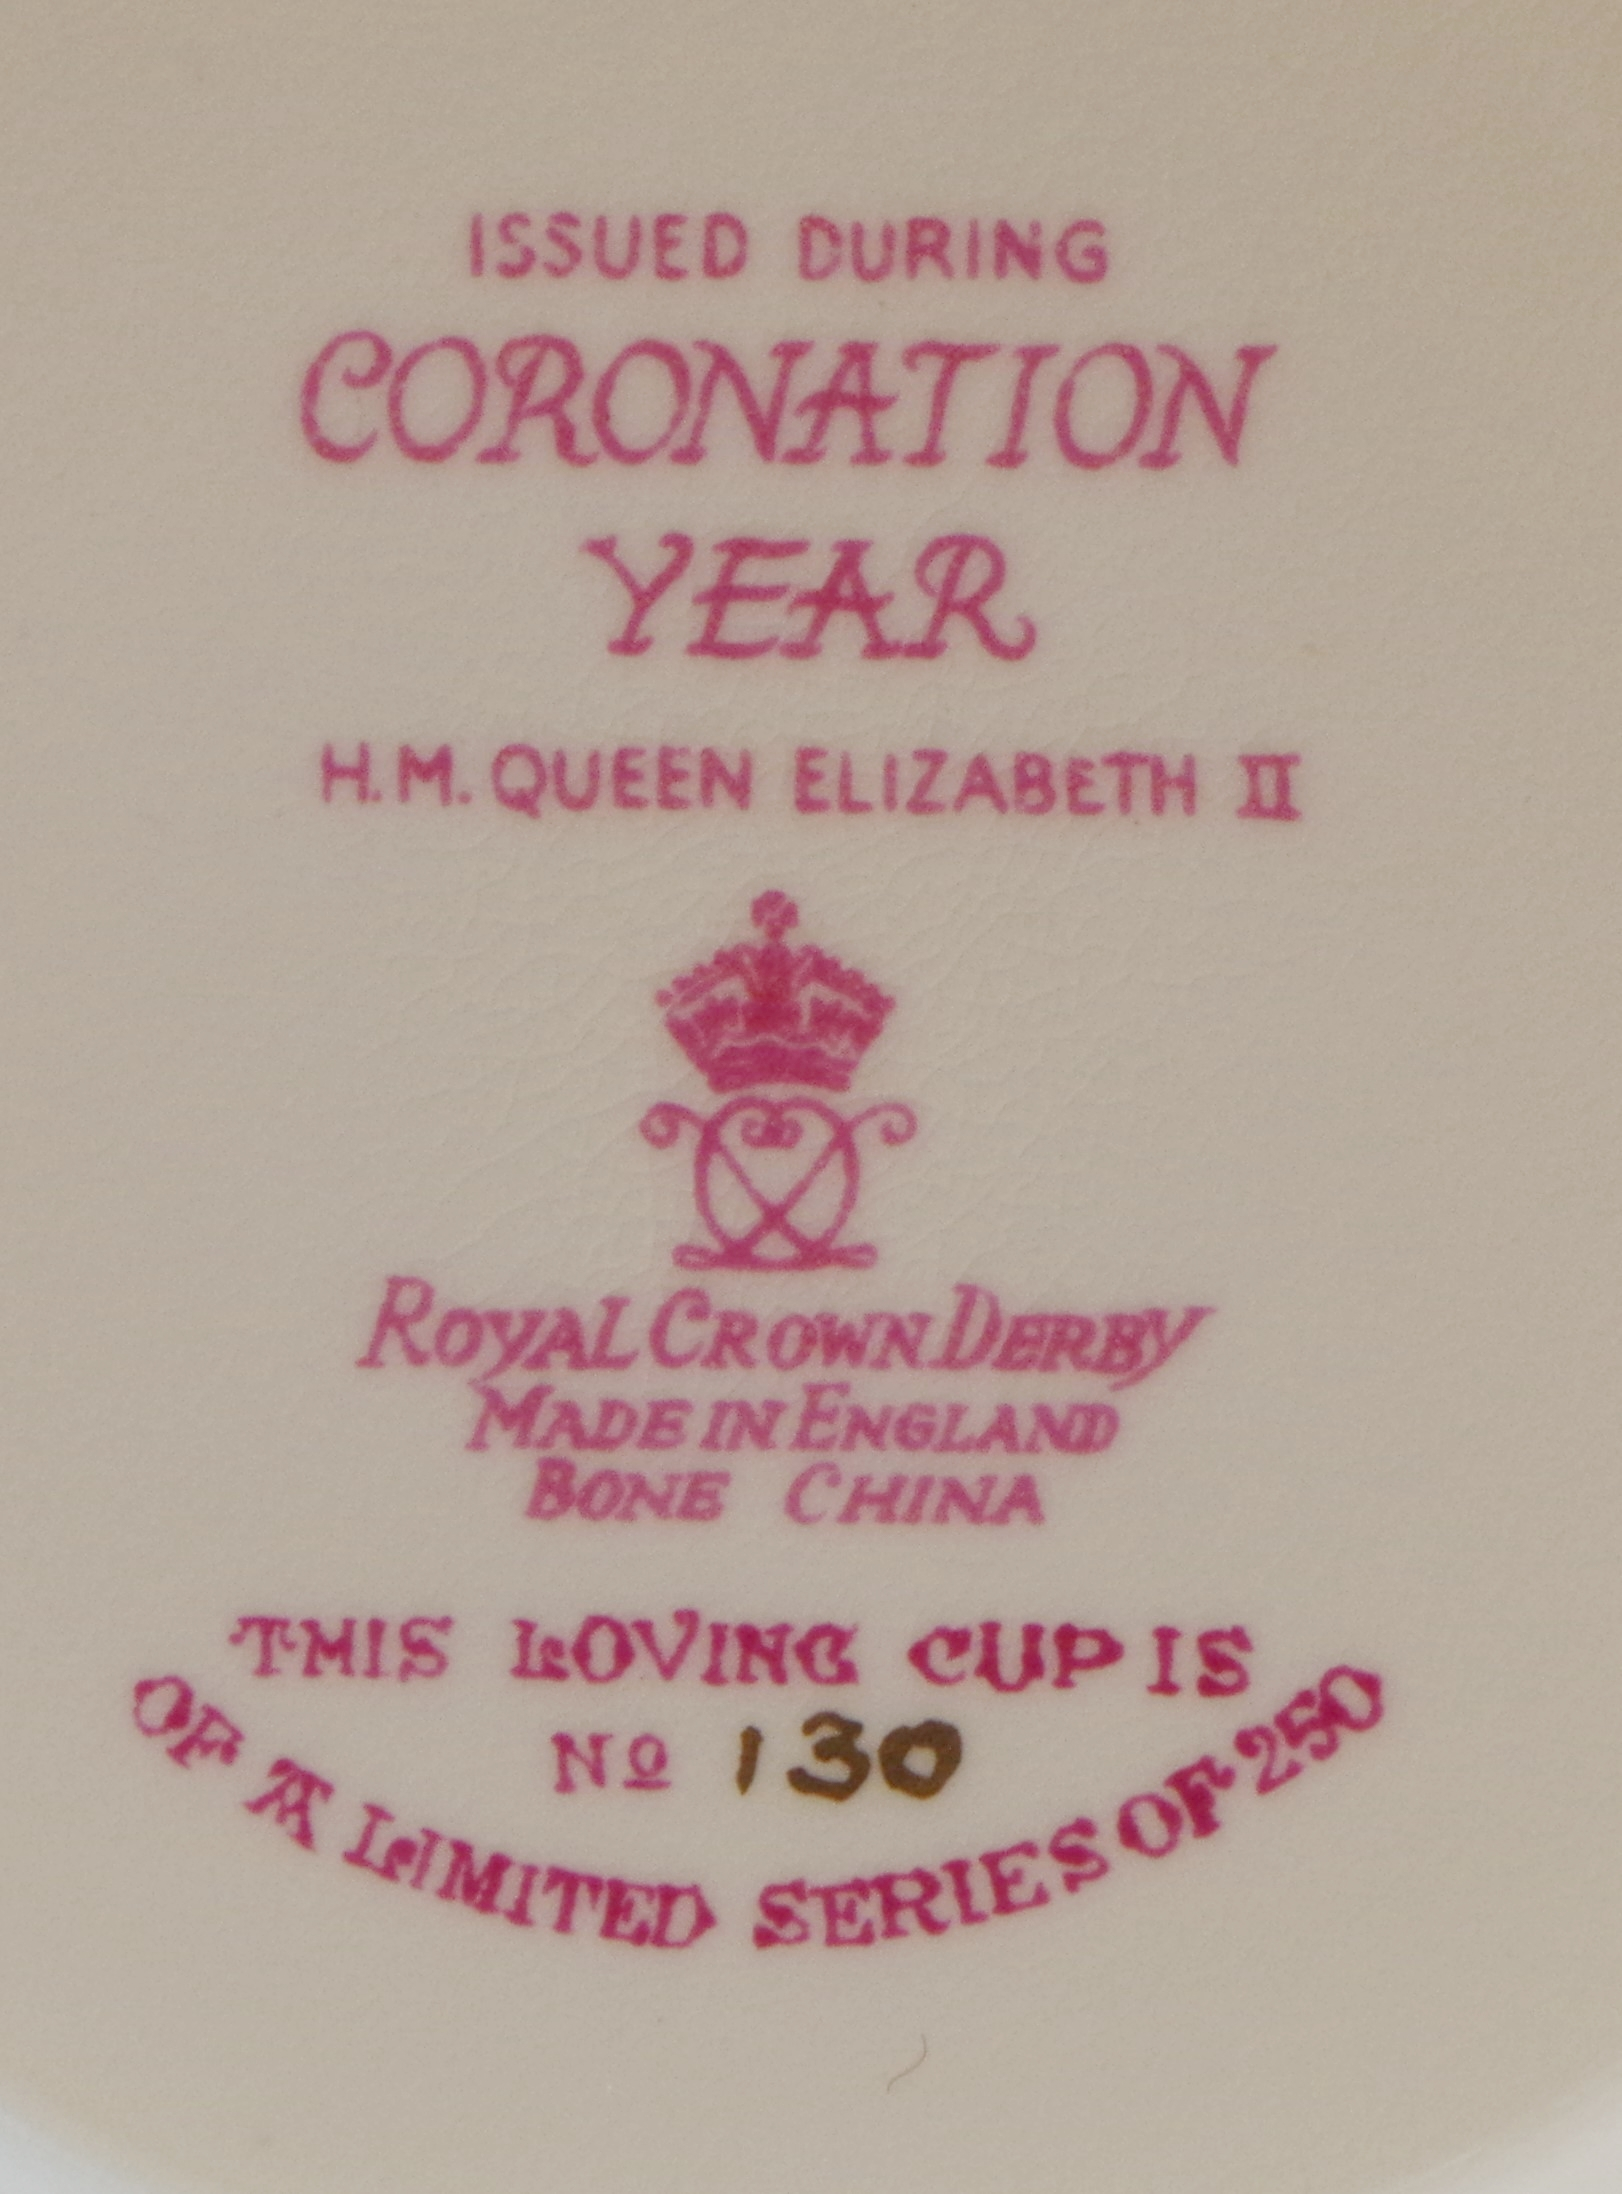 royal-crown-derby-gadroon-elizabeth-II-coronation-tray 1953-reverse